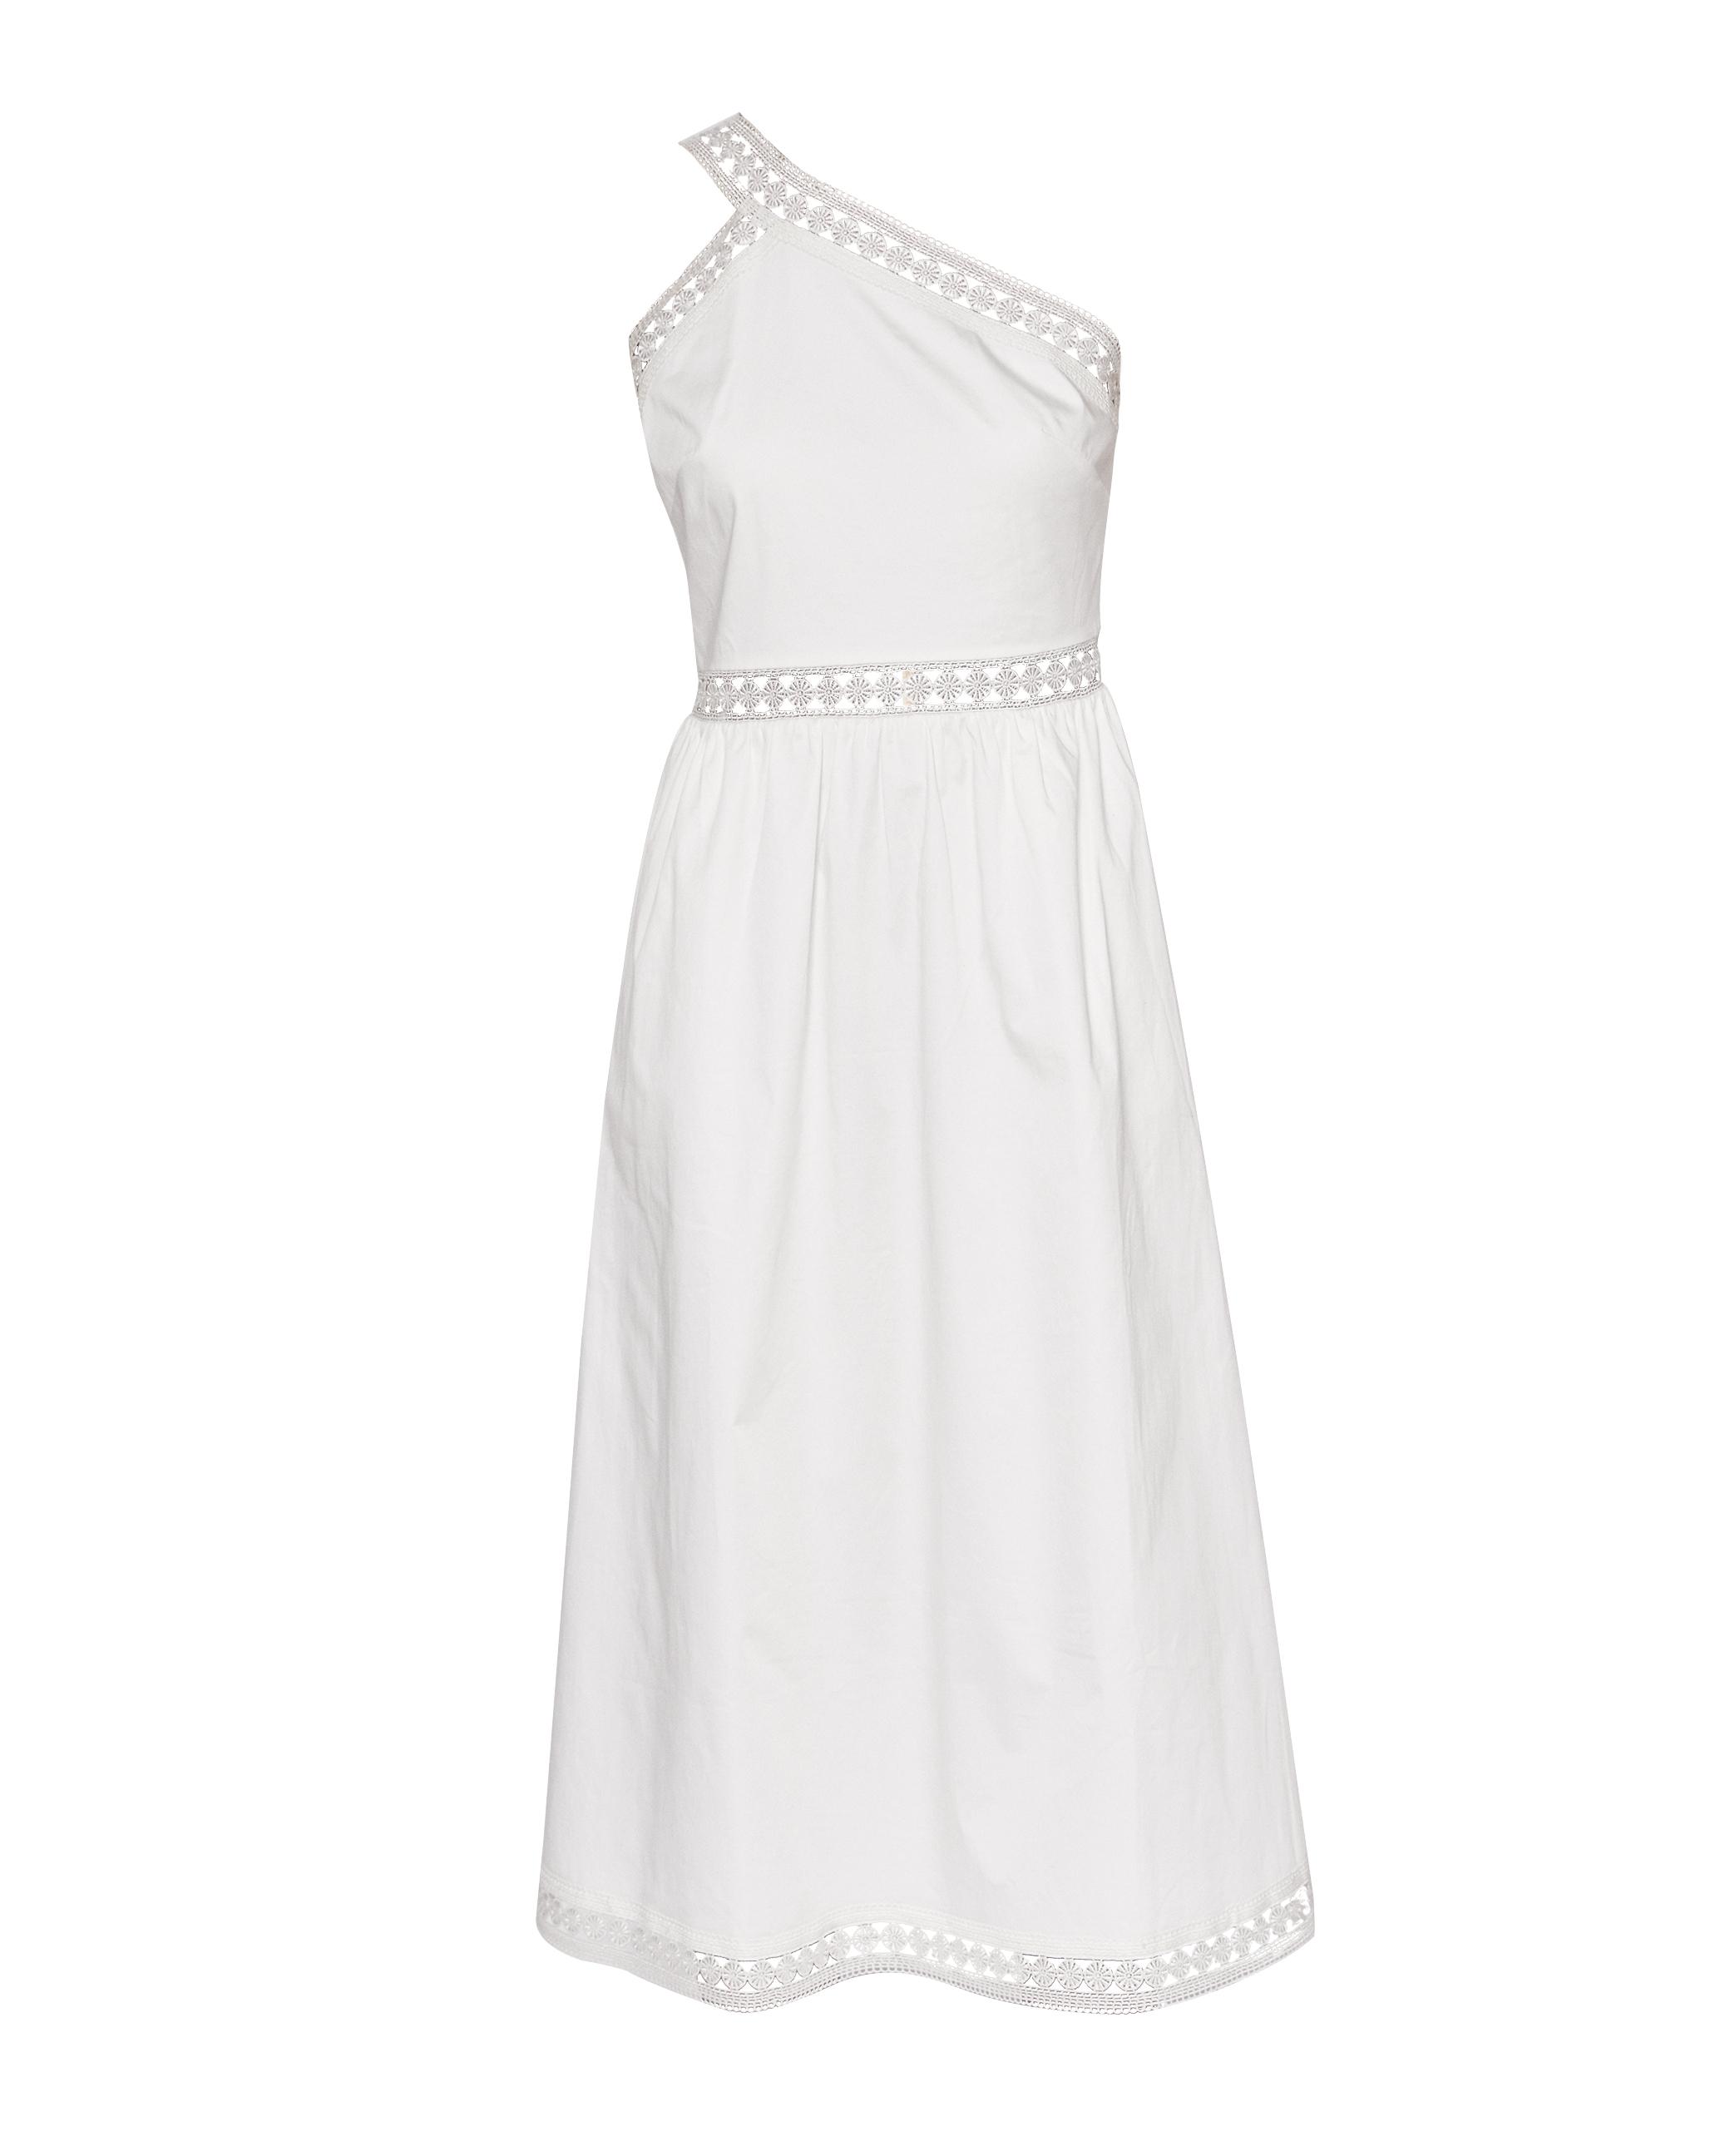 Ted Baker, Kallii dress, was £99 now £53